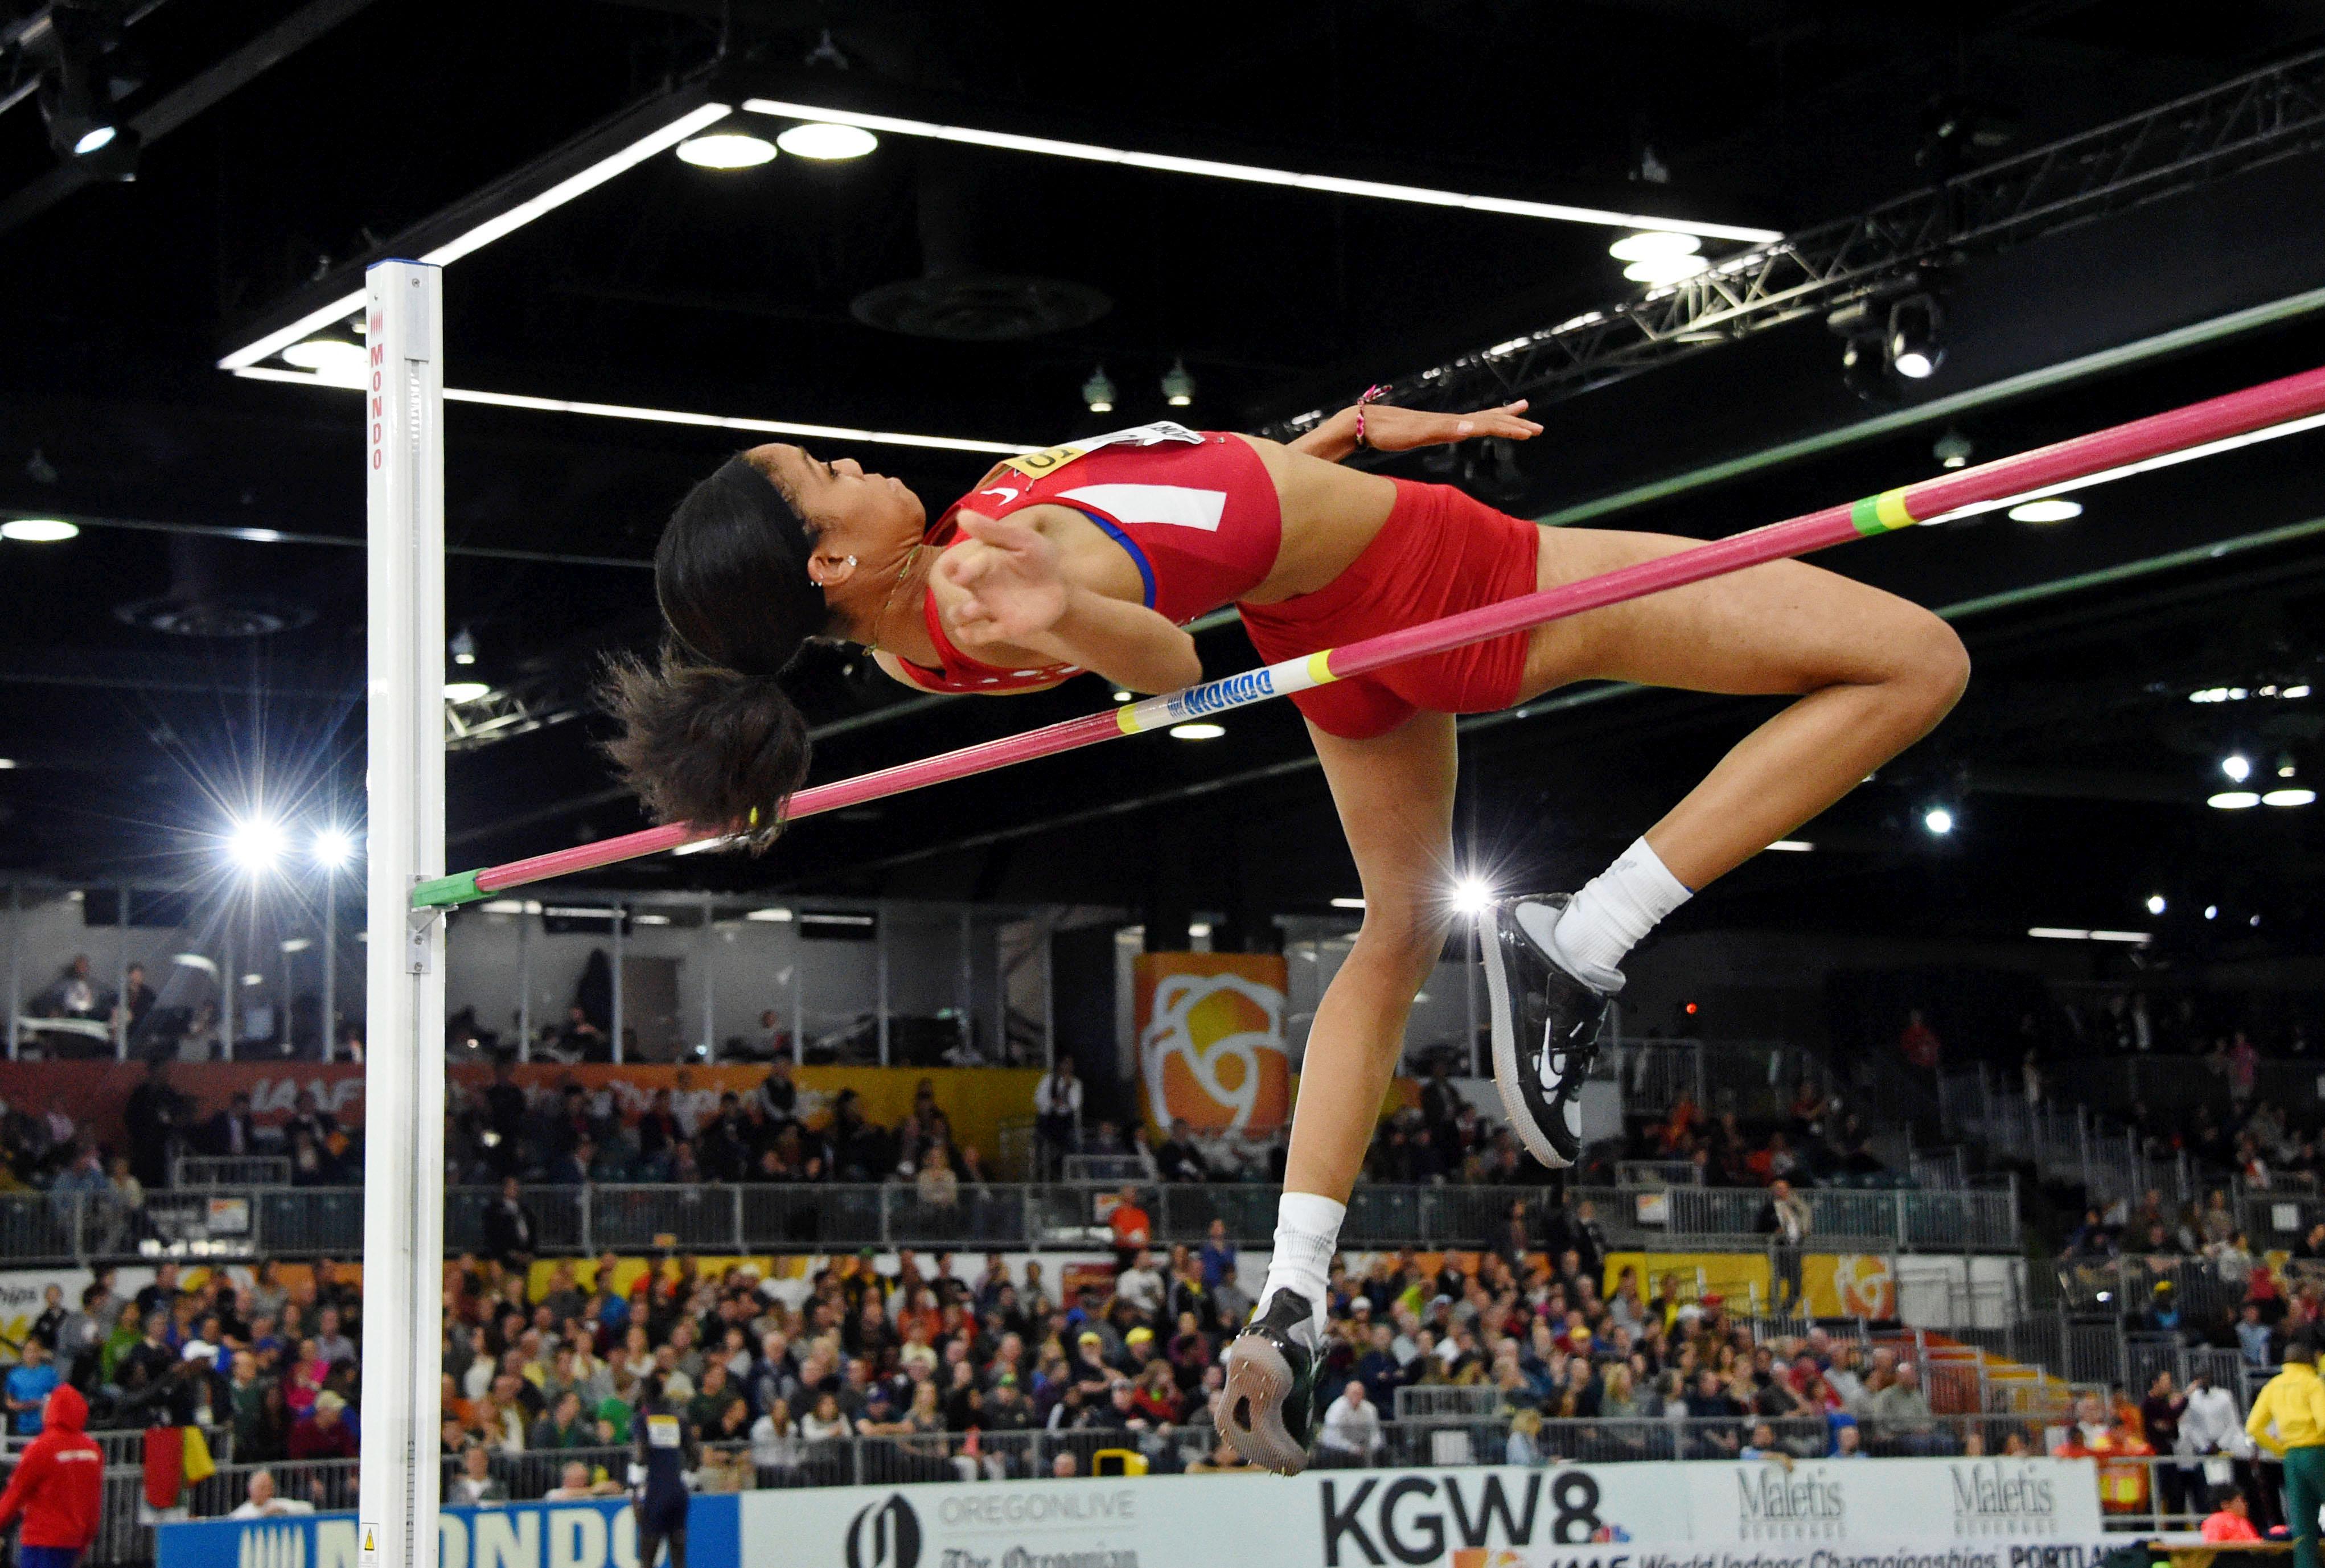 Vashti Cunningham wins the women's high jump at 6-5 (1.96m). (Photo: Kirby Lee, USA TODAY Sports)